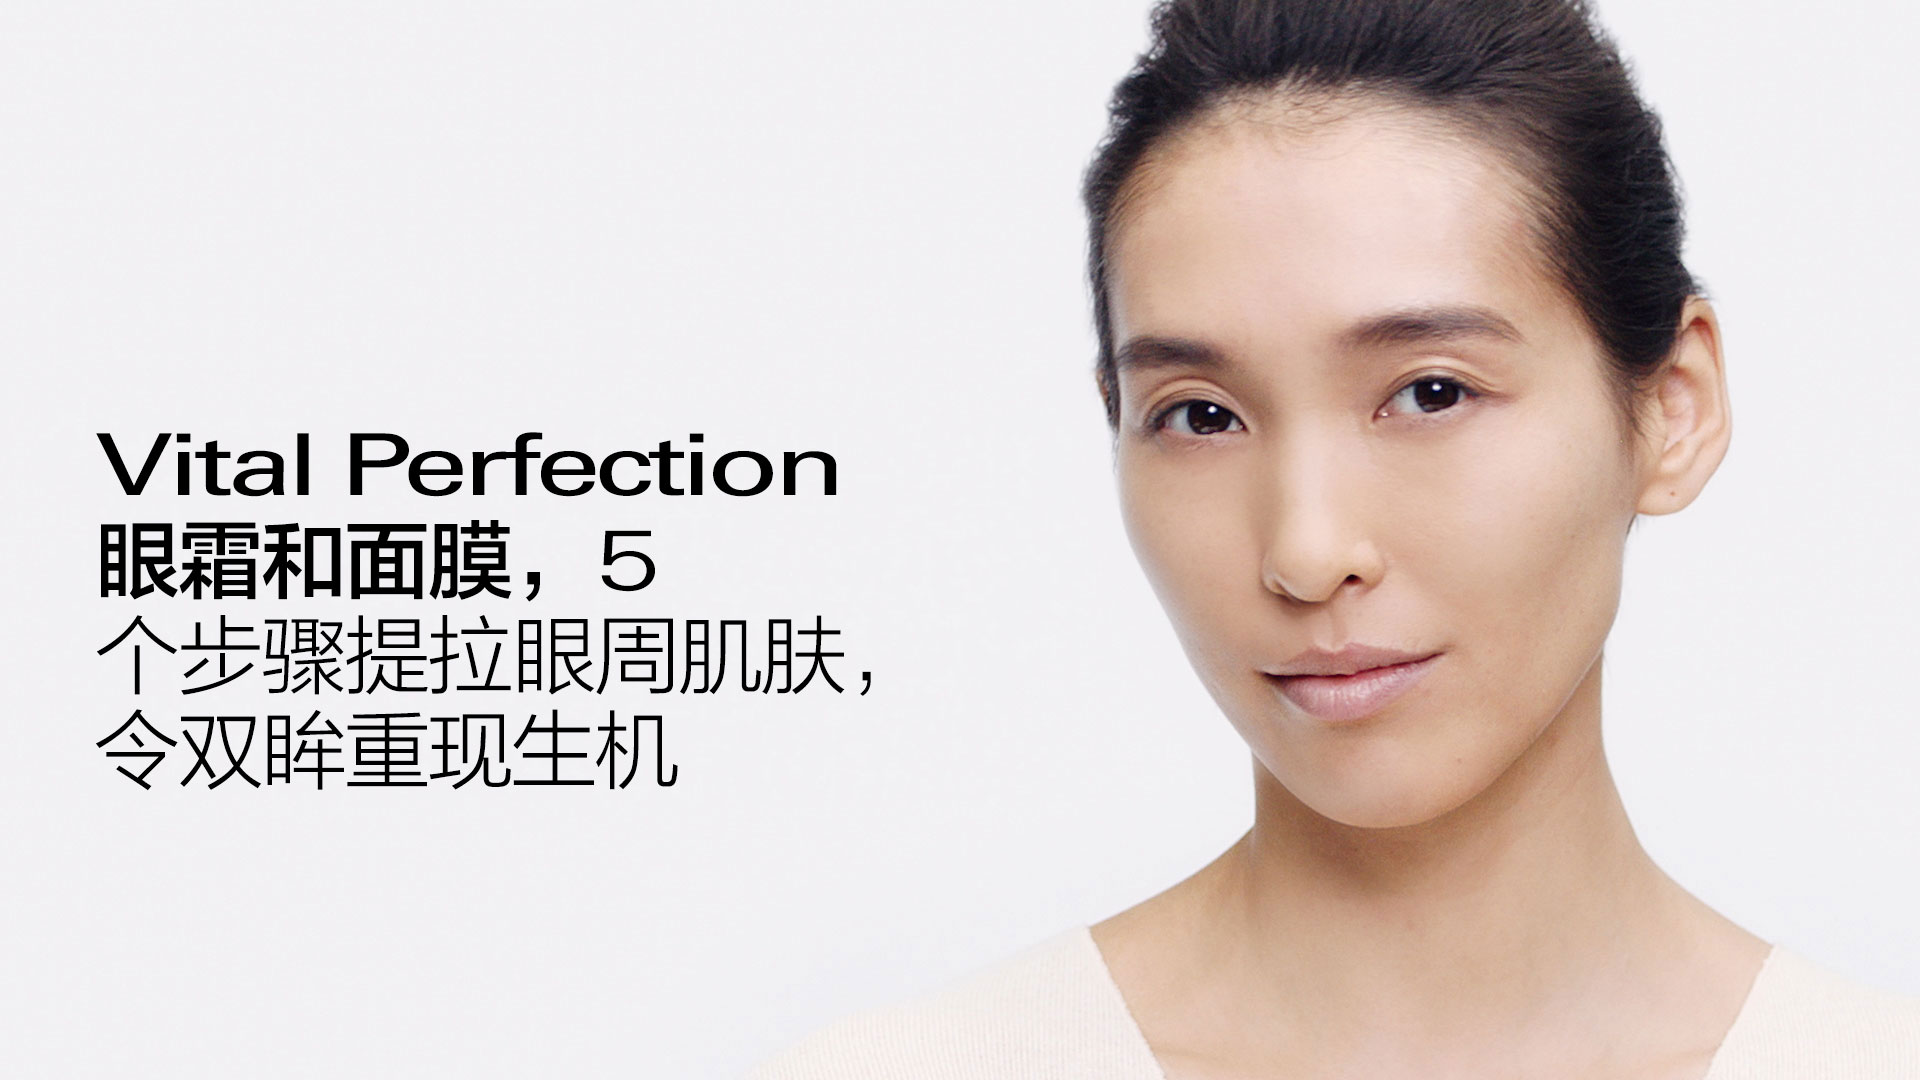 Vital Perfection眼部专属护肤方案 - 立即观看